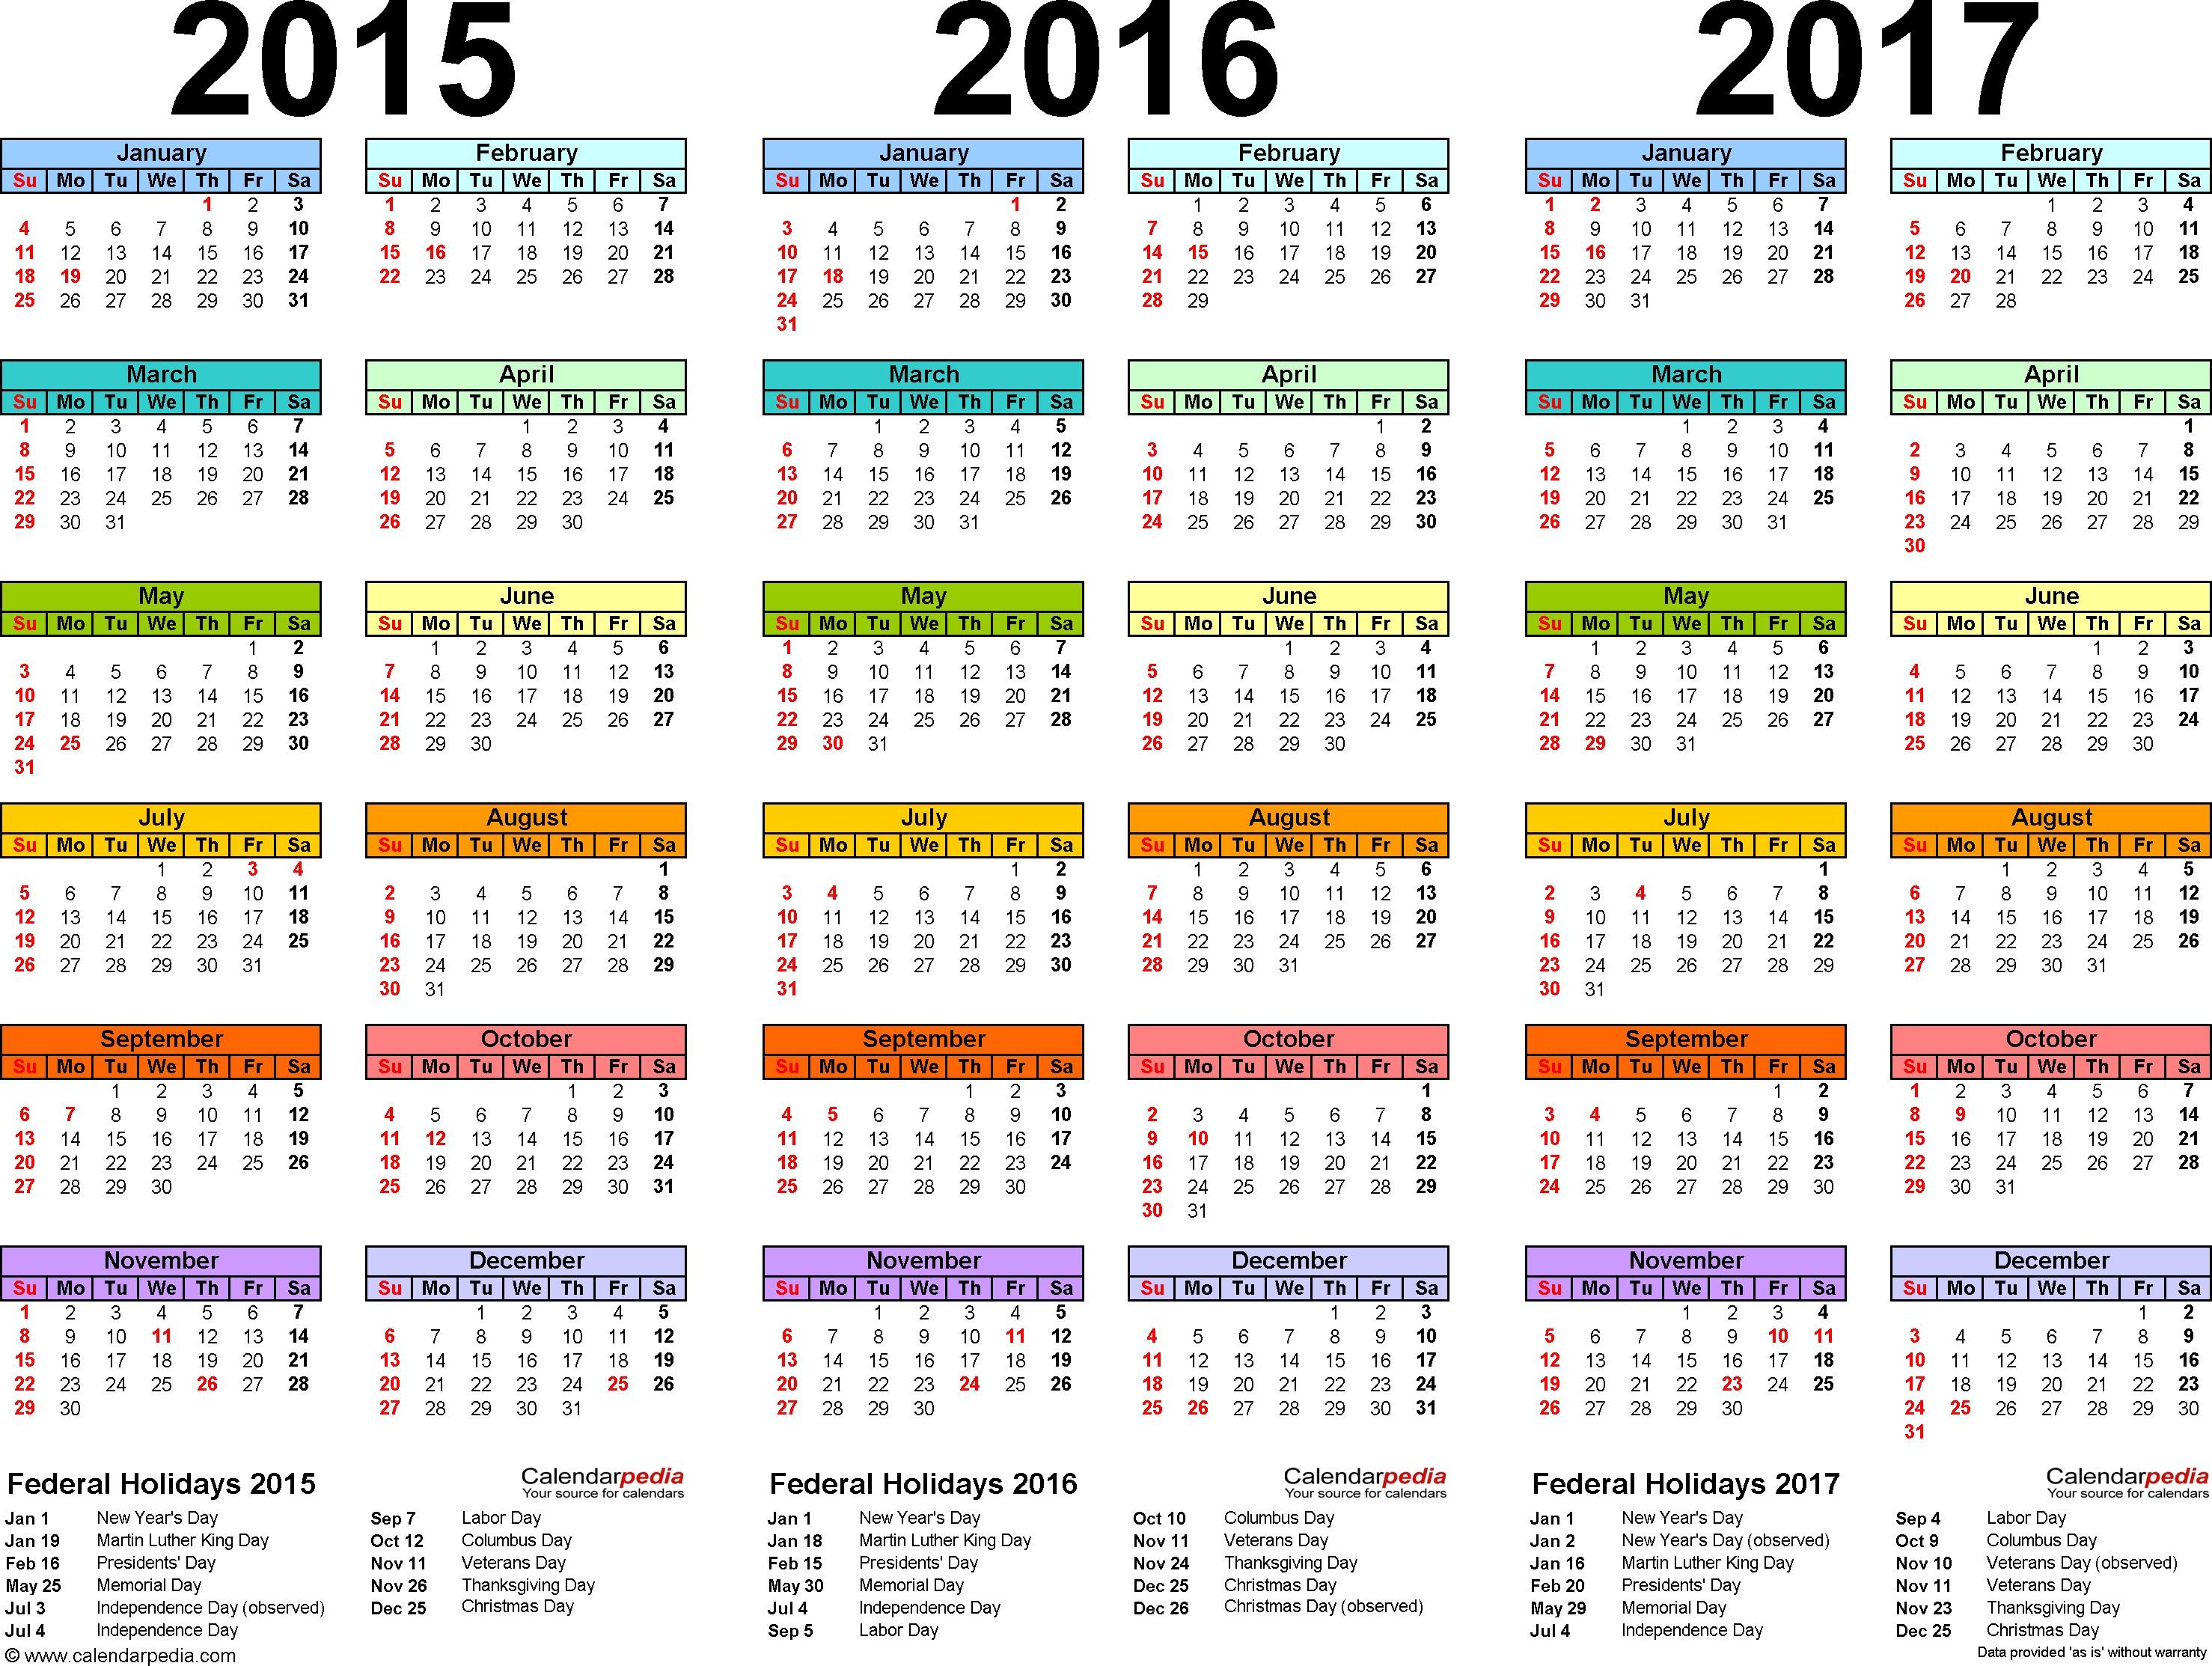 2015 2016 2017 calendar 4 three year printable PDF calendars